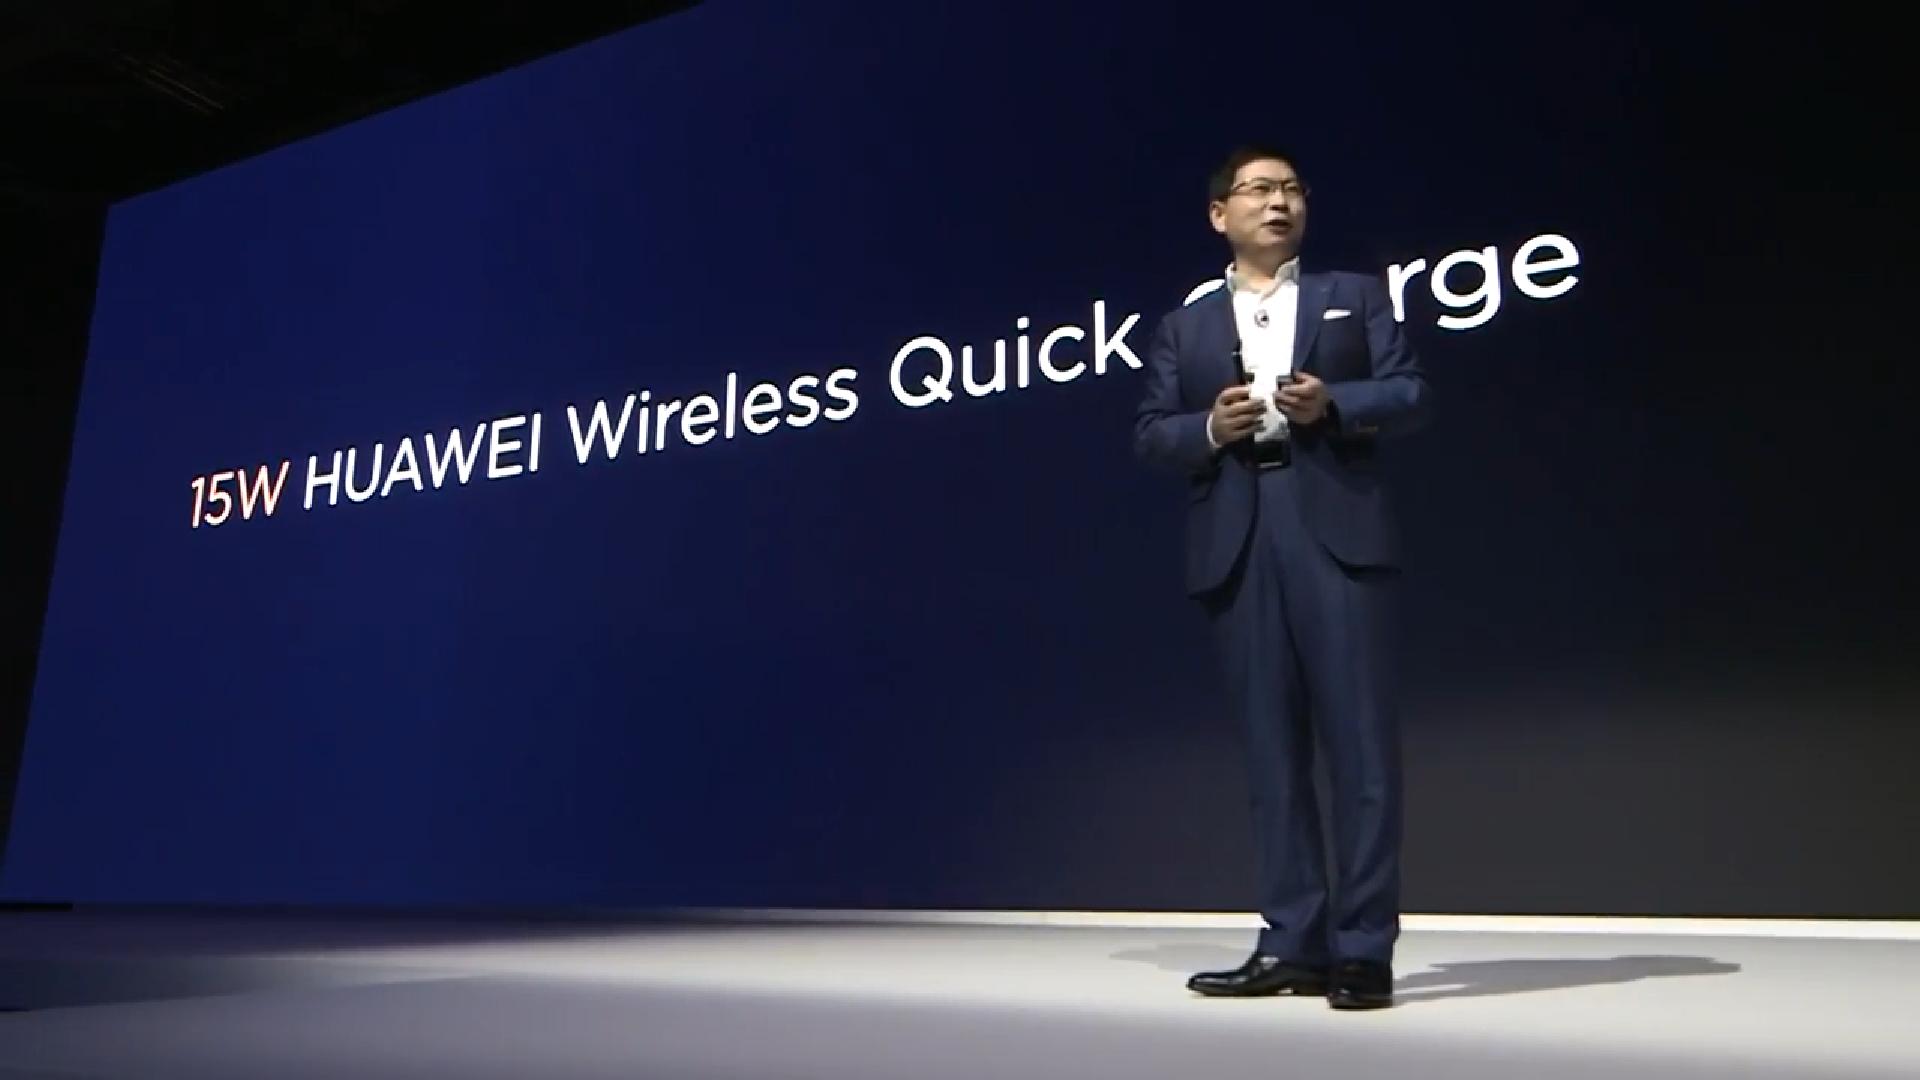 Huawei Mate 20 Pro – 9